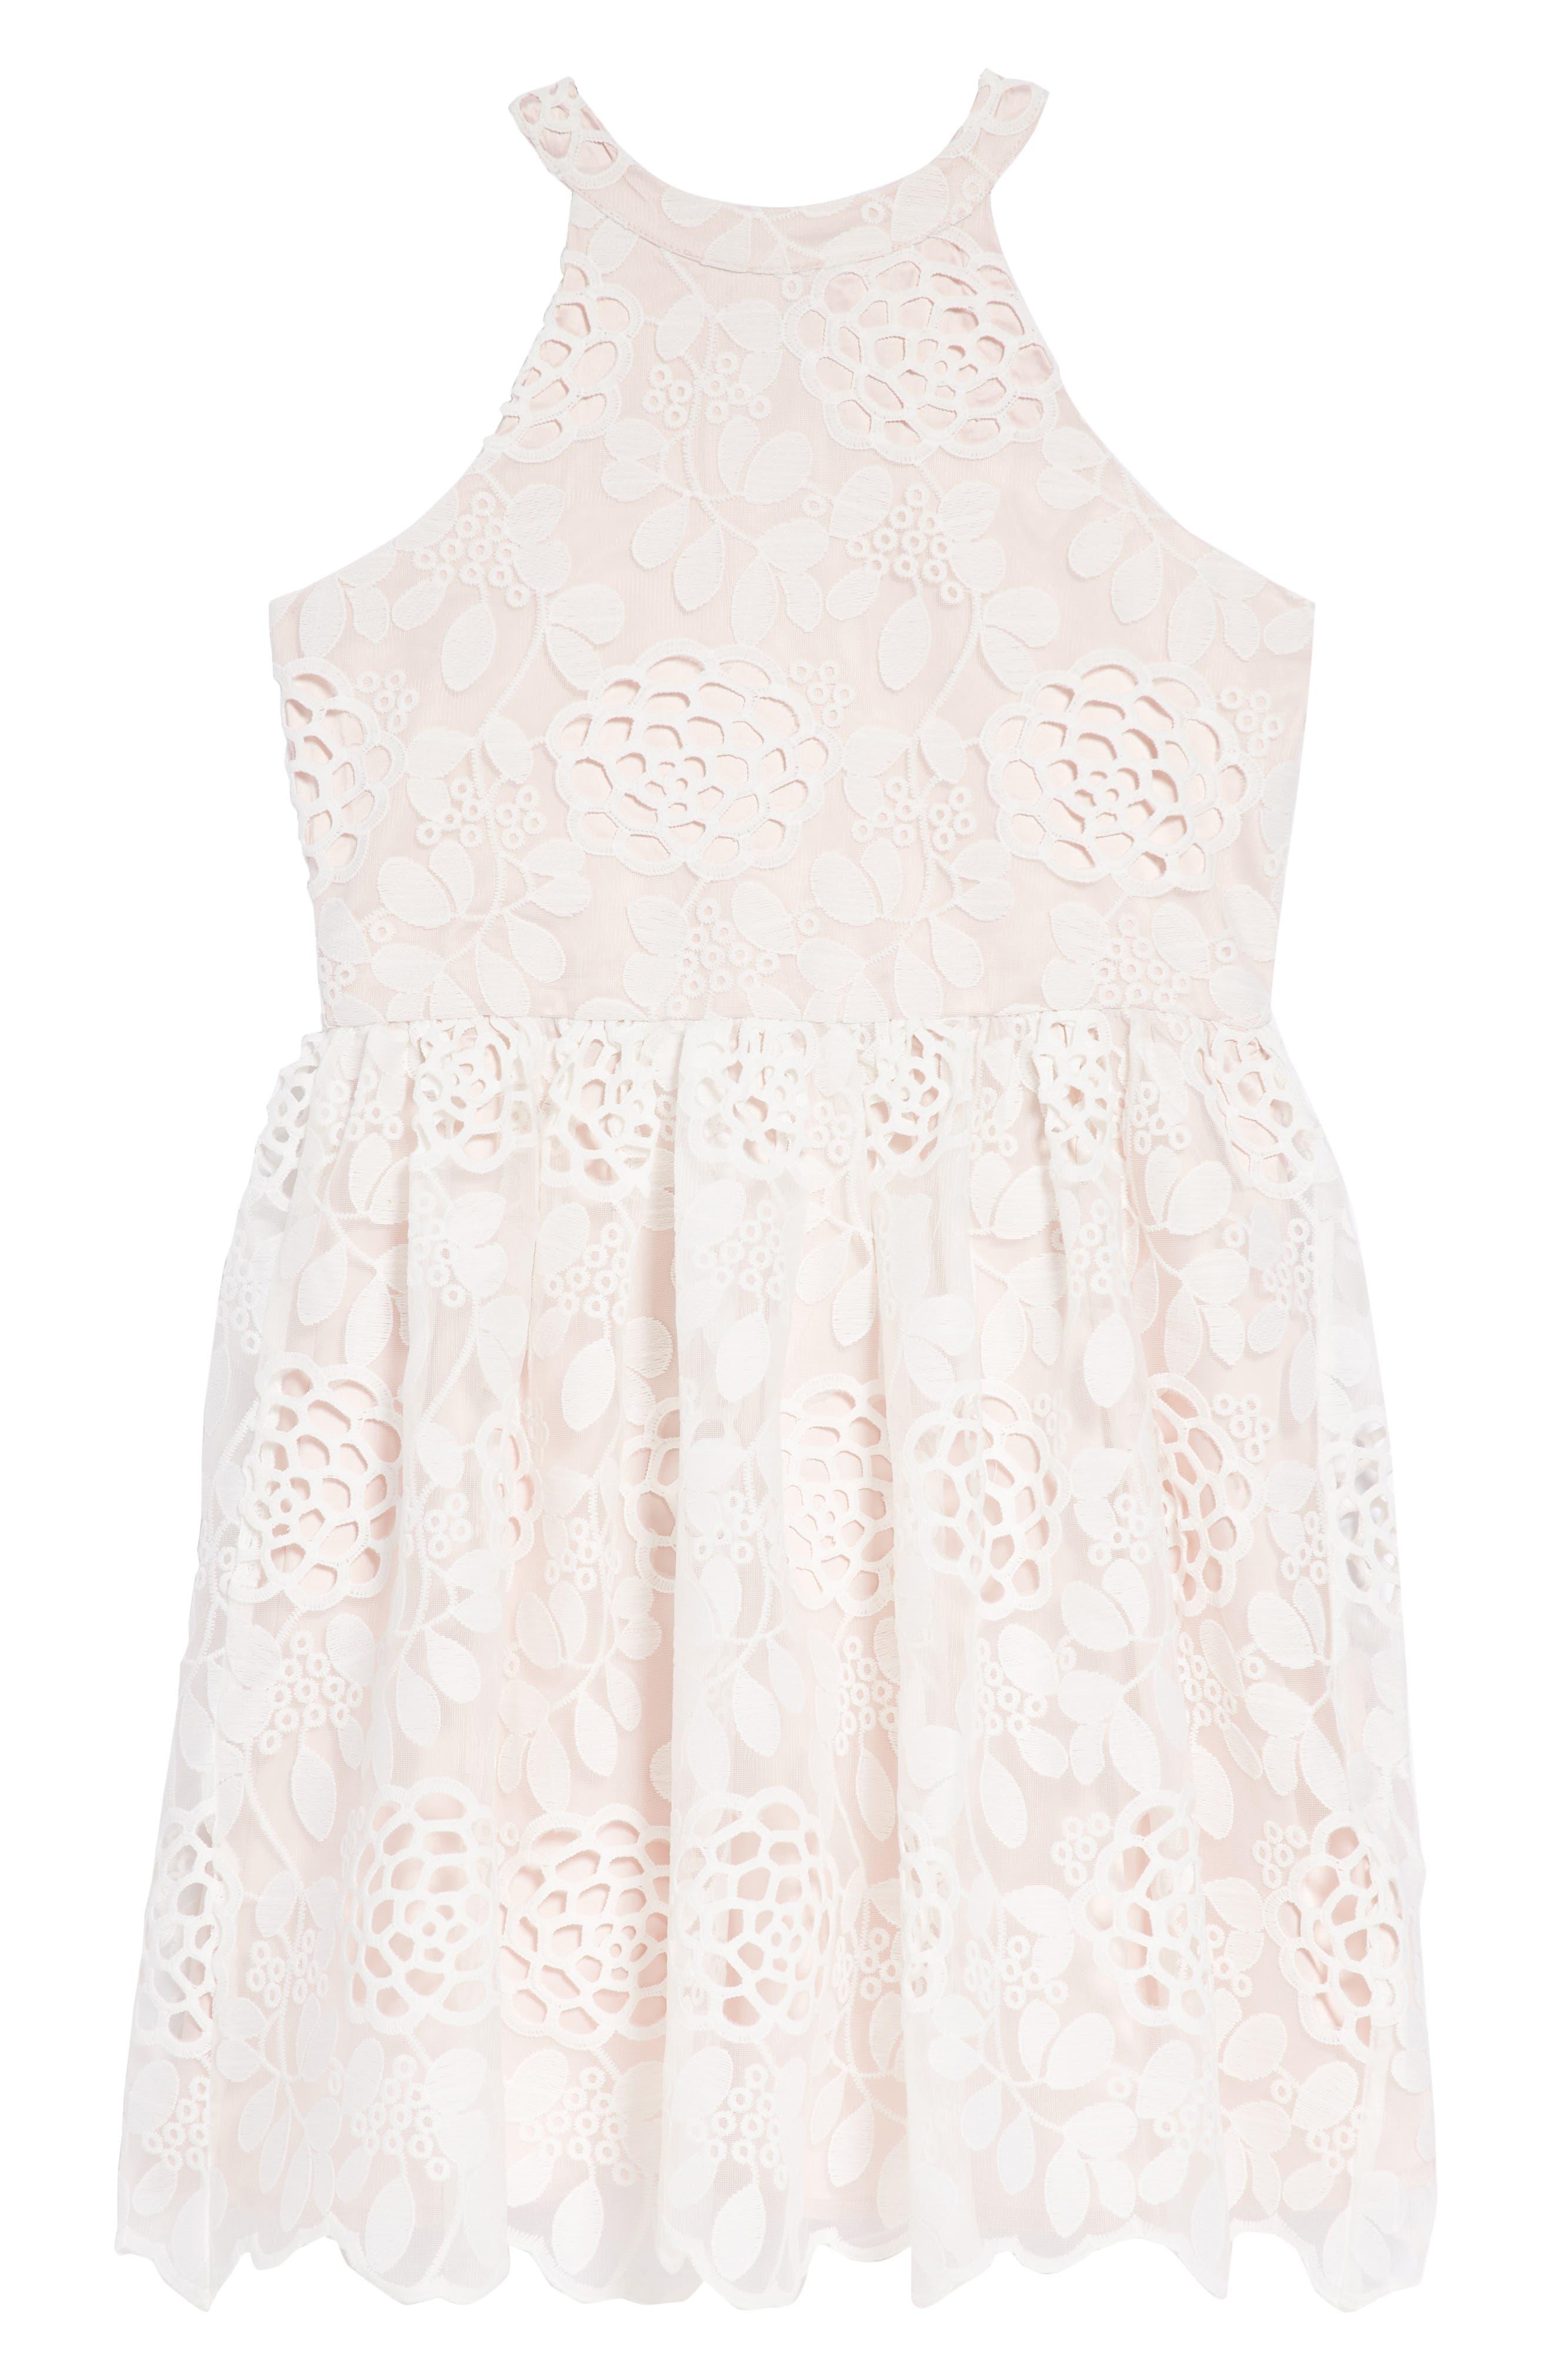 Primrose Lace Dress,                         Main,                         color, Orchid White